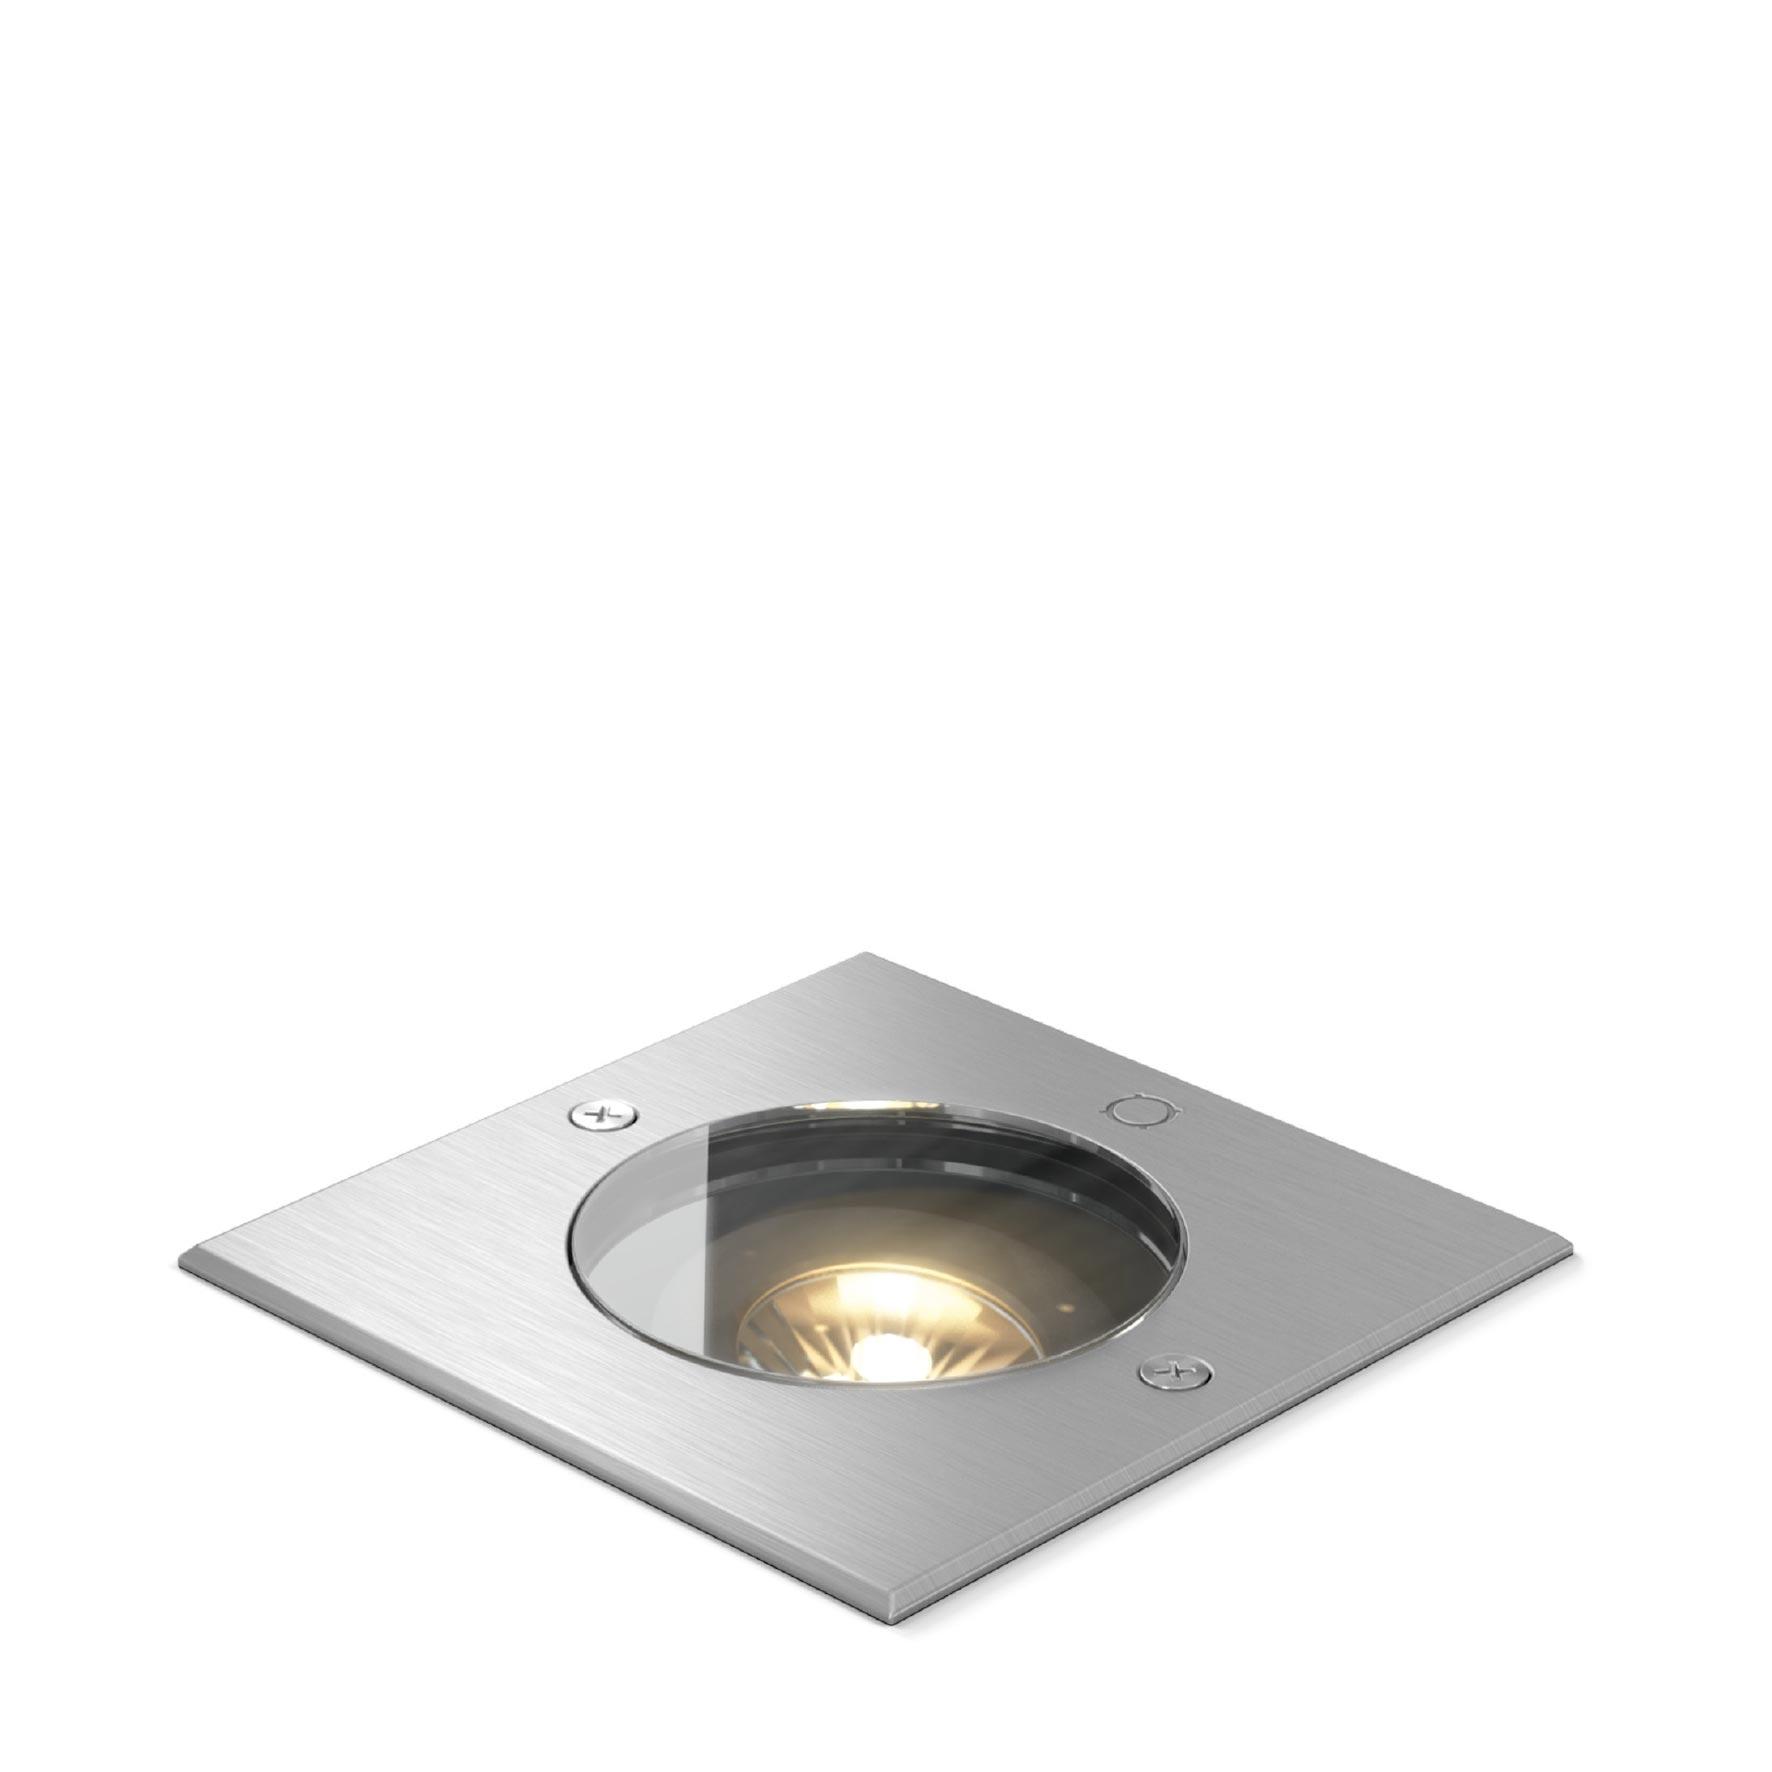 Chip 1.6 inox